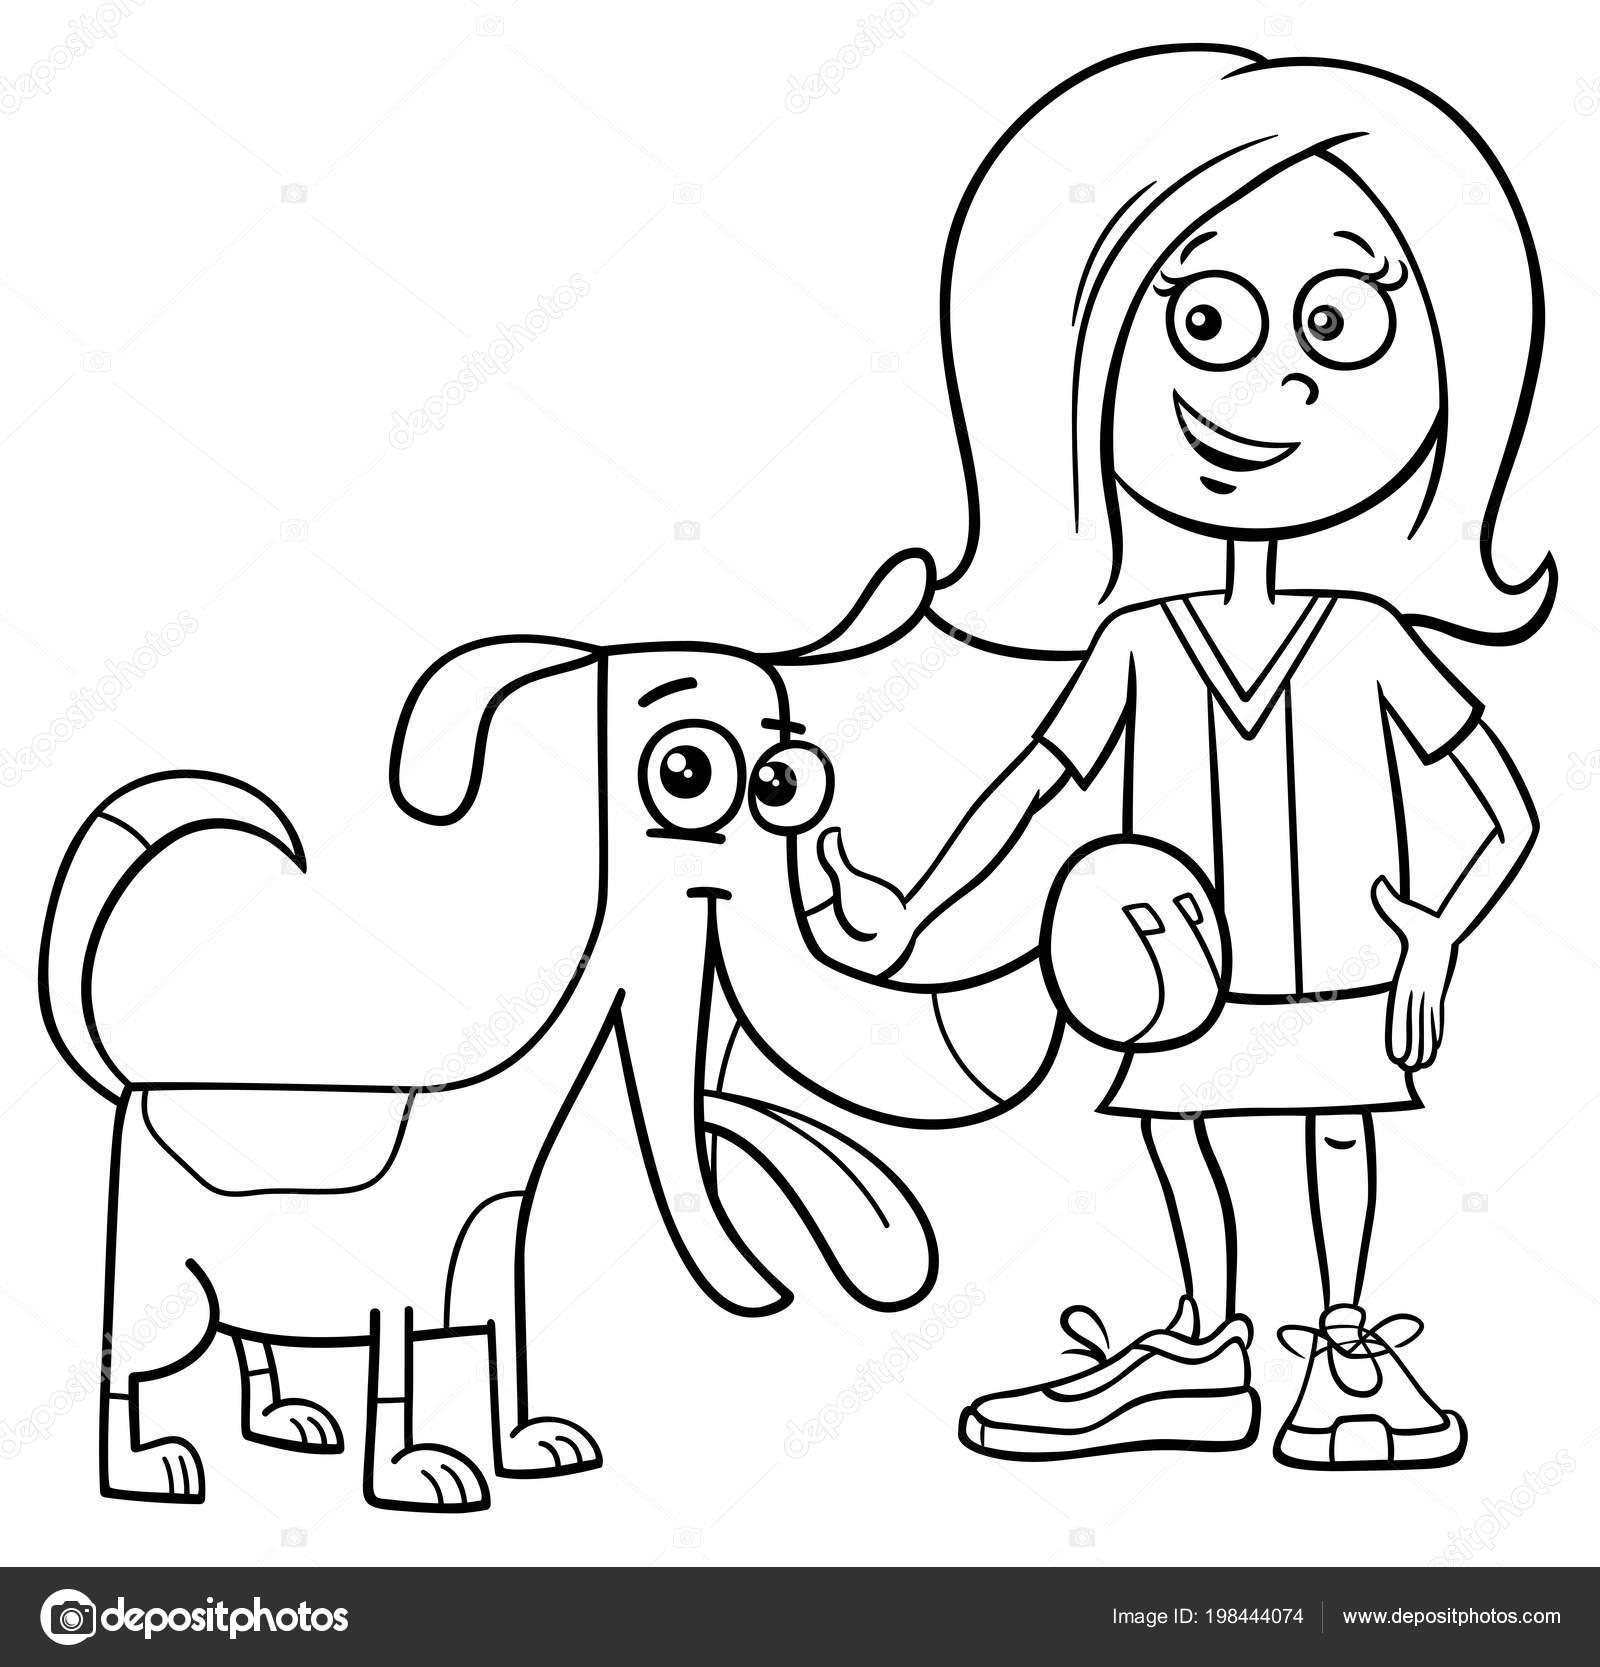 Blanco Negro Ilustracion Dibujos Animados Nino Nina Con Divertido